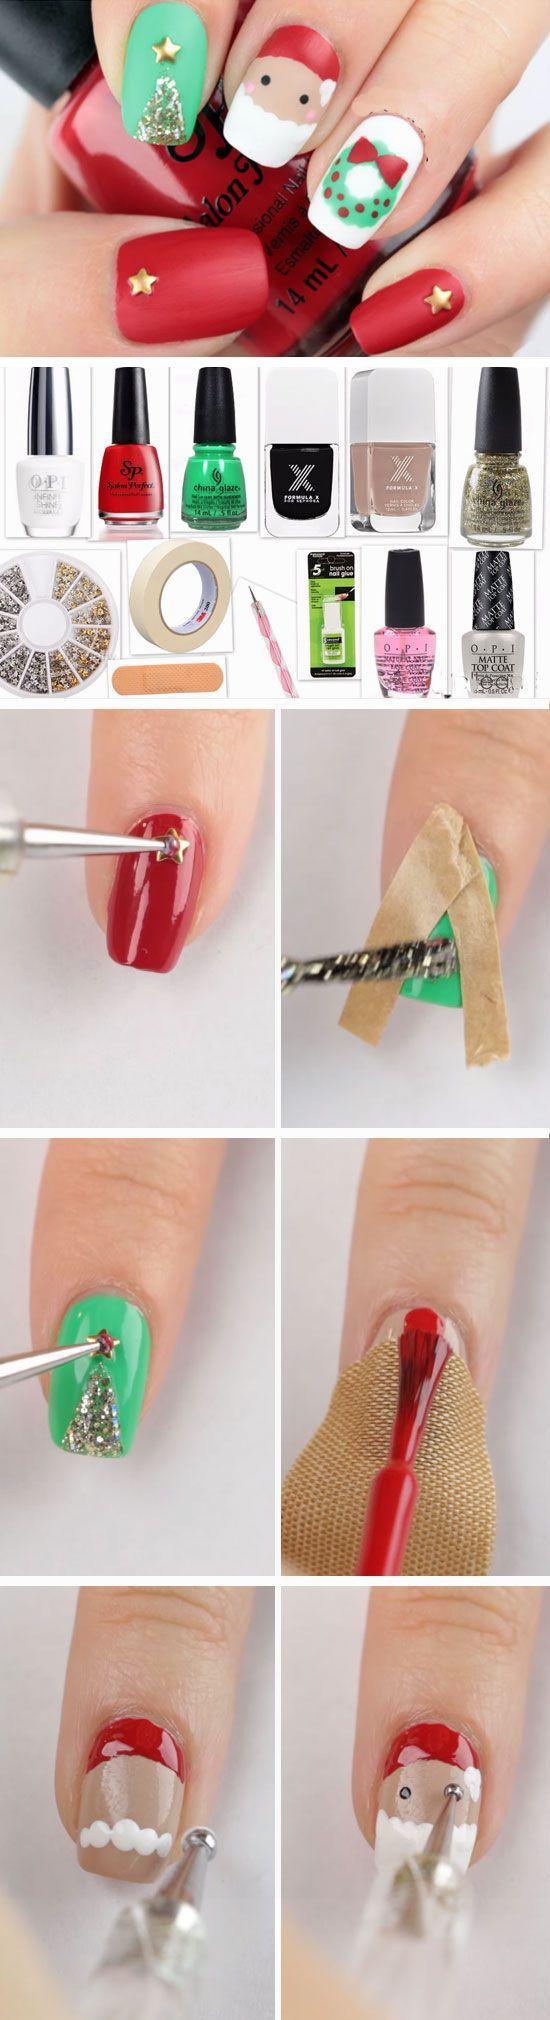 Freehand matte easy diy christmas nail designs for kids kidsnails